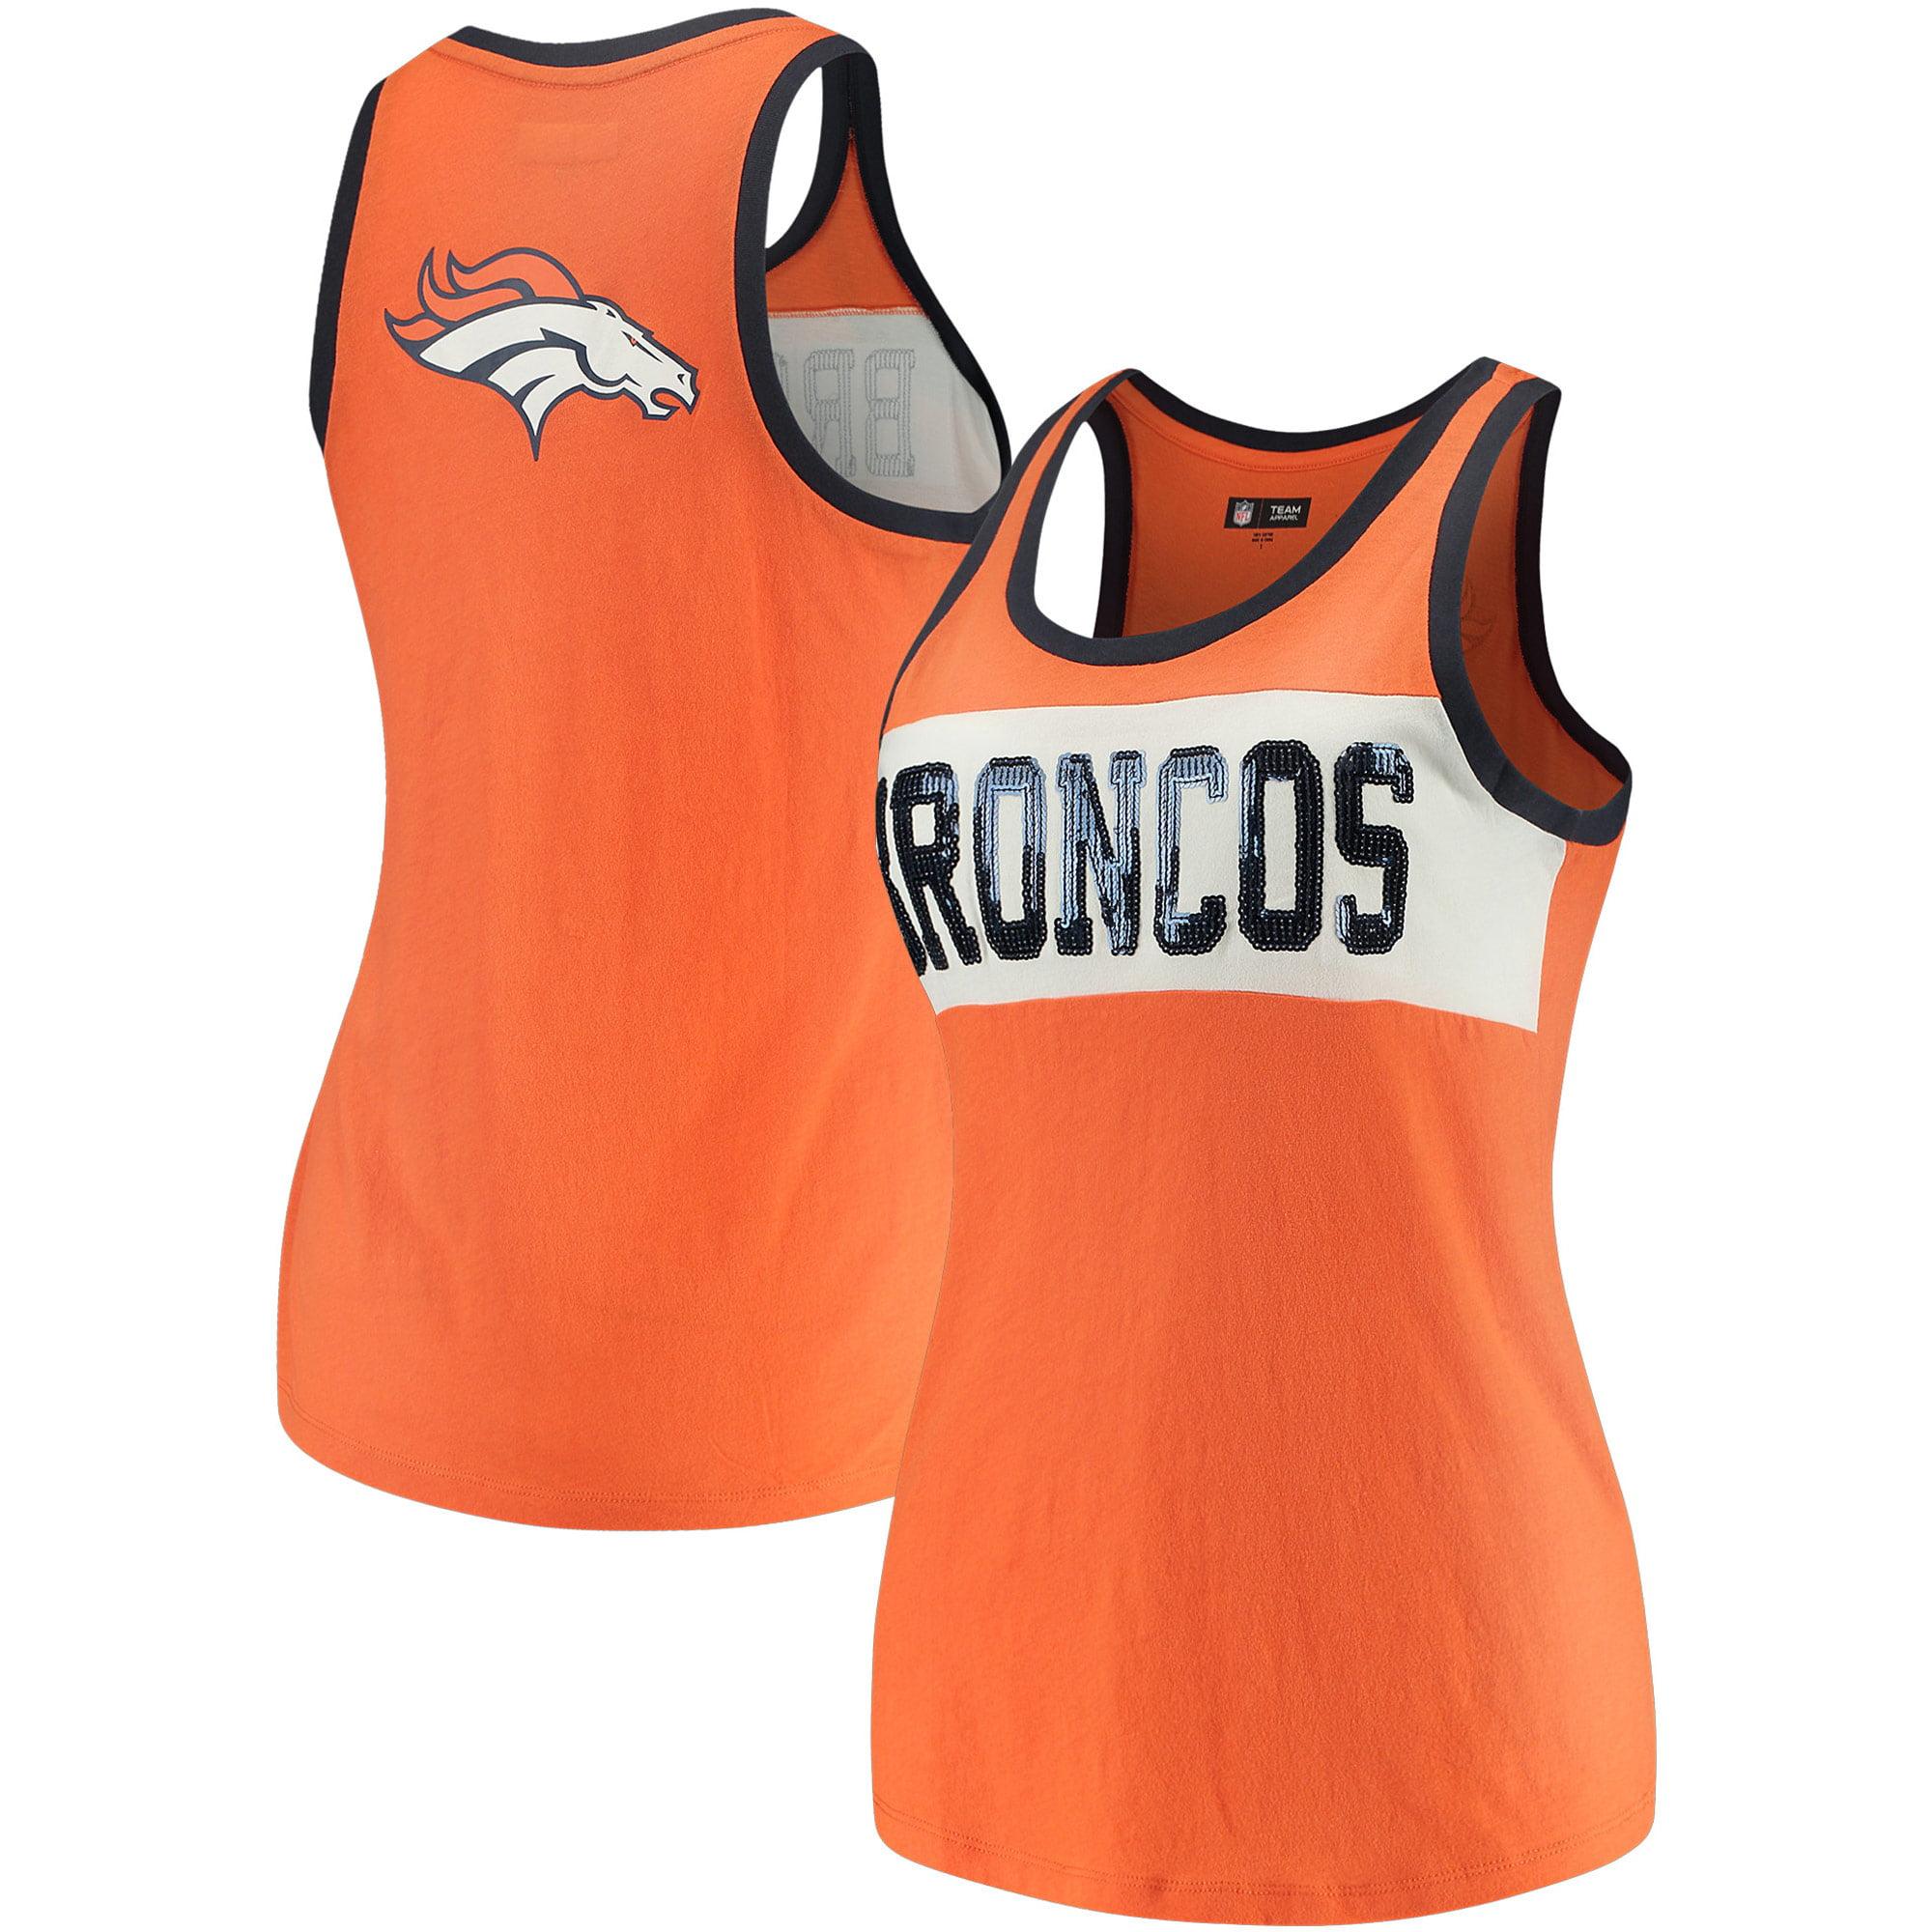 Denver Broncos 5th & Ocean by New Era Women's Sequin Baby Jersey Tank Top - Orange/White